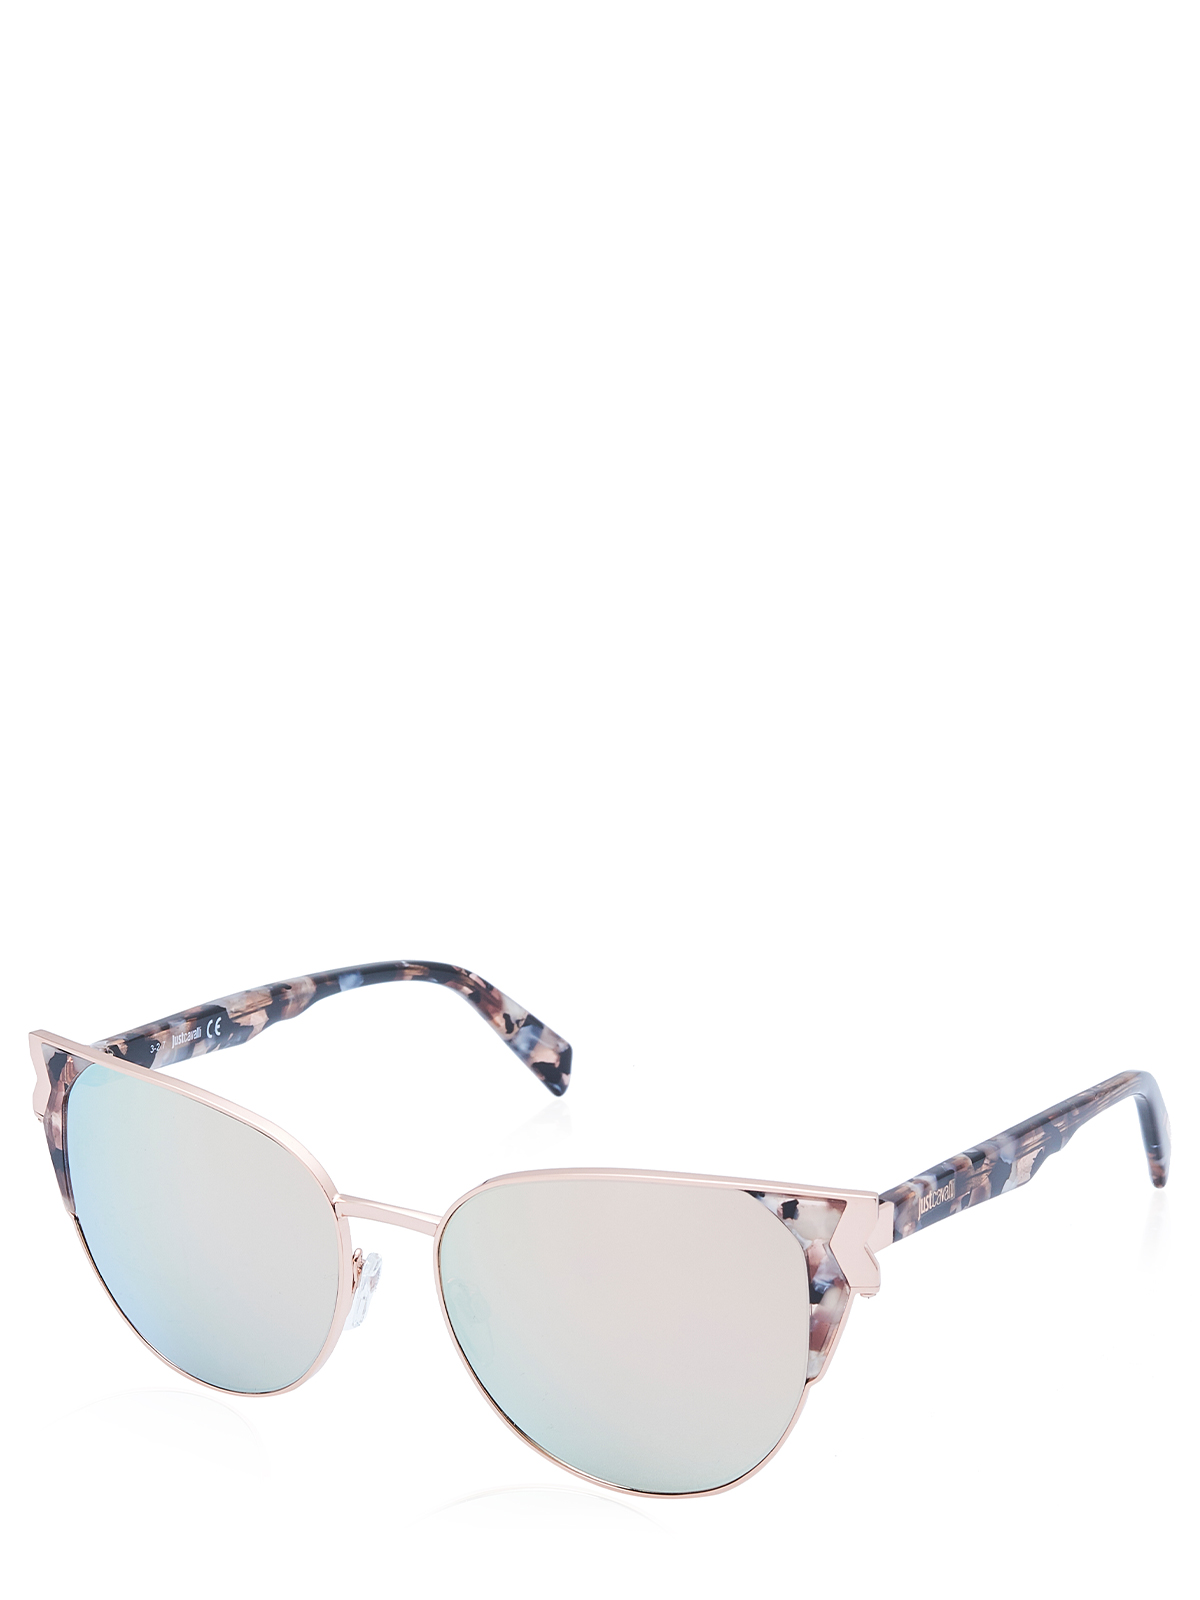 Just Cavalli Sunglasses JC825S/S